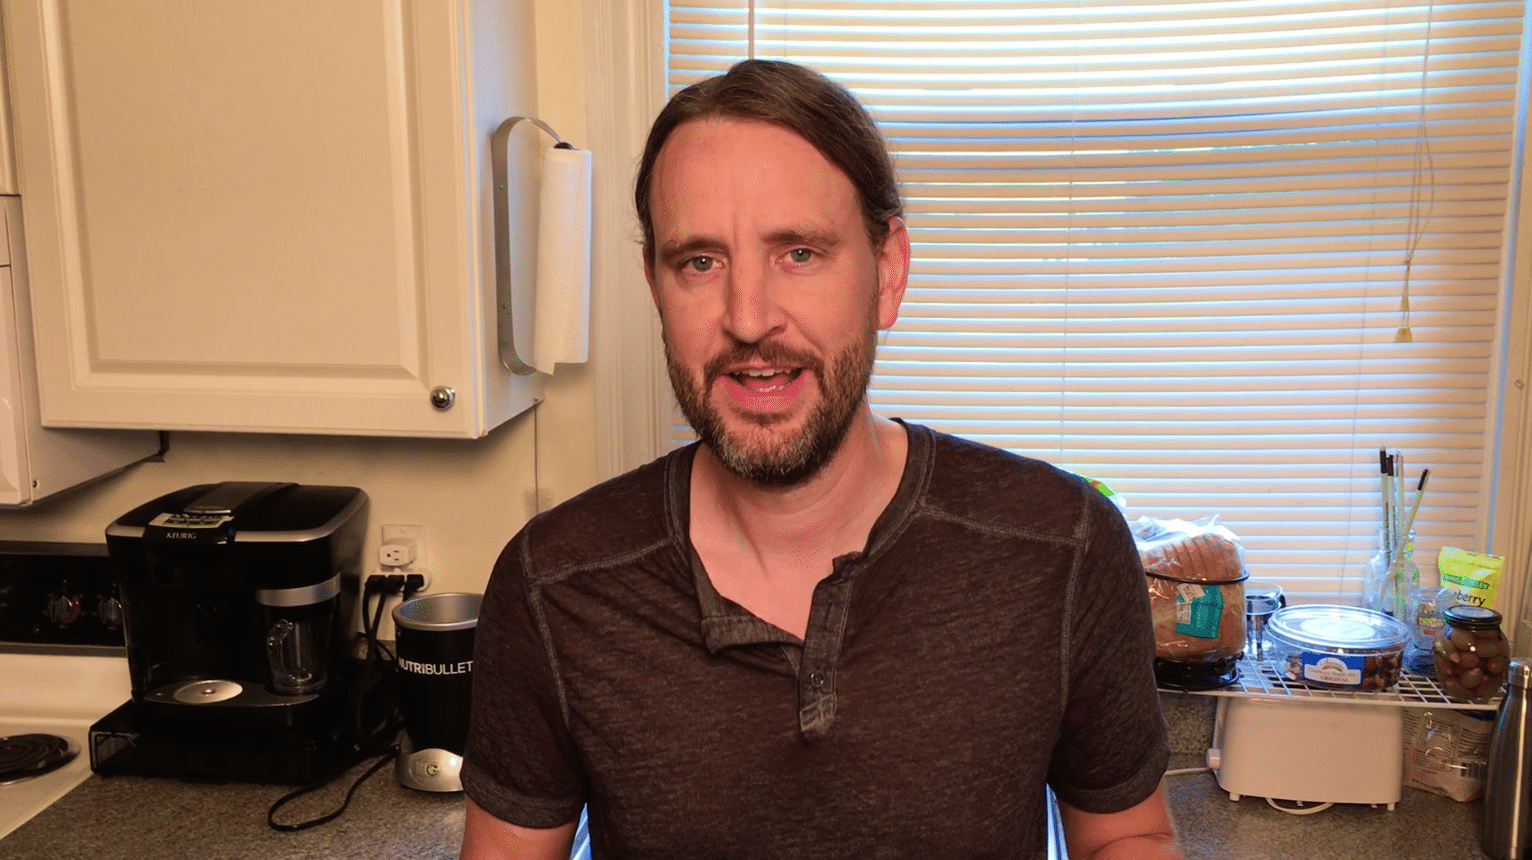 PersonalityHacker.com-JOEL-VIDEO-08312016-morning-smoothie-beginners